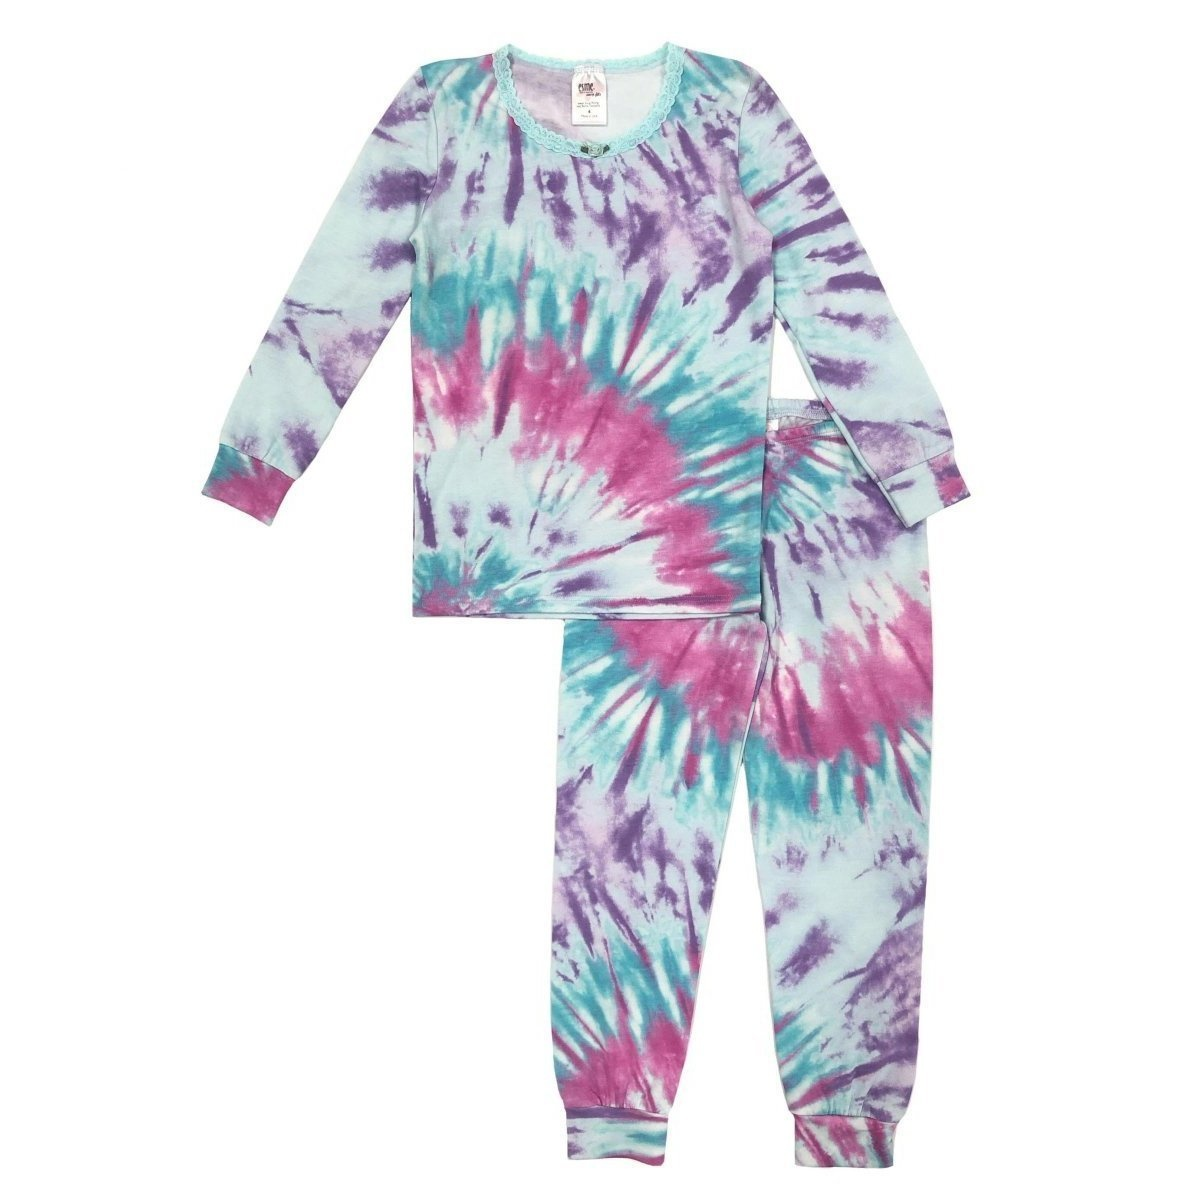 Esme Bright Tie Dye  L/S Set - Infant